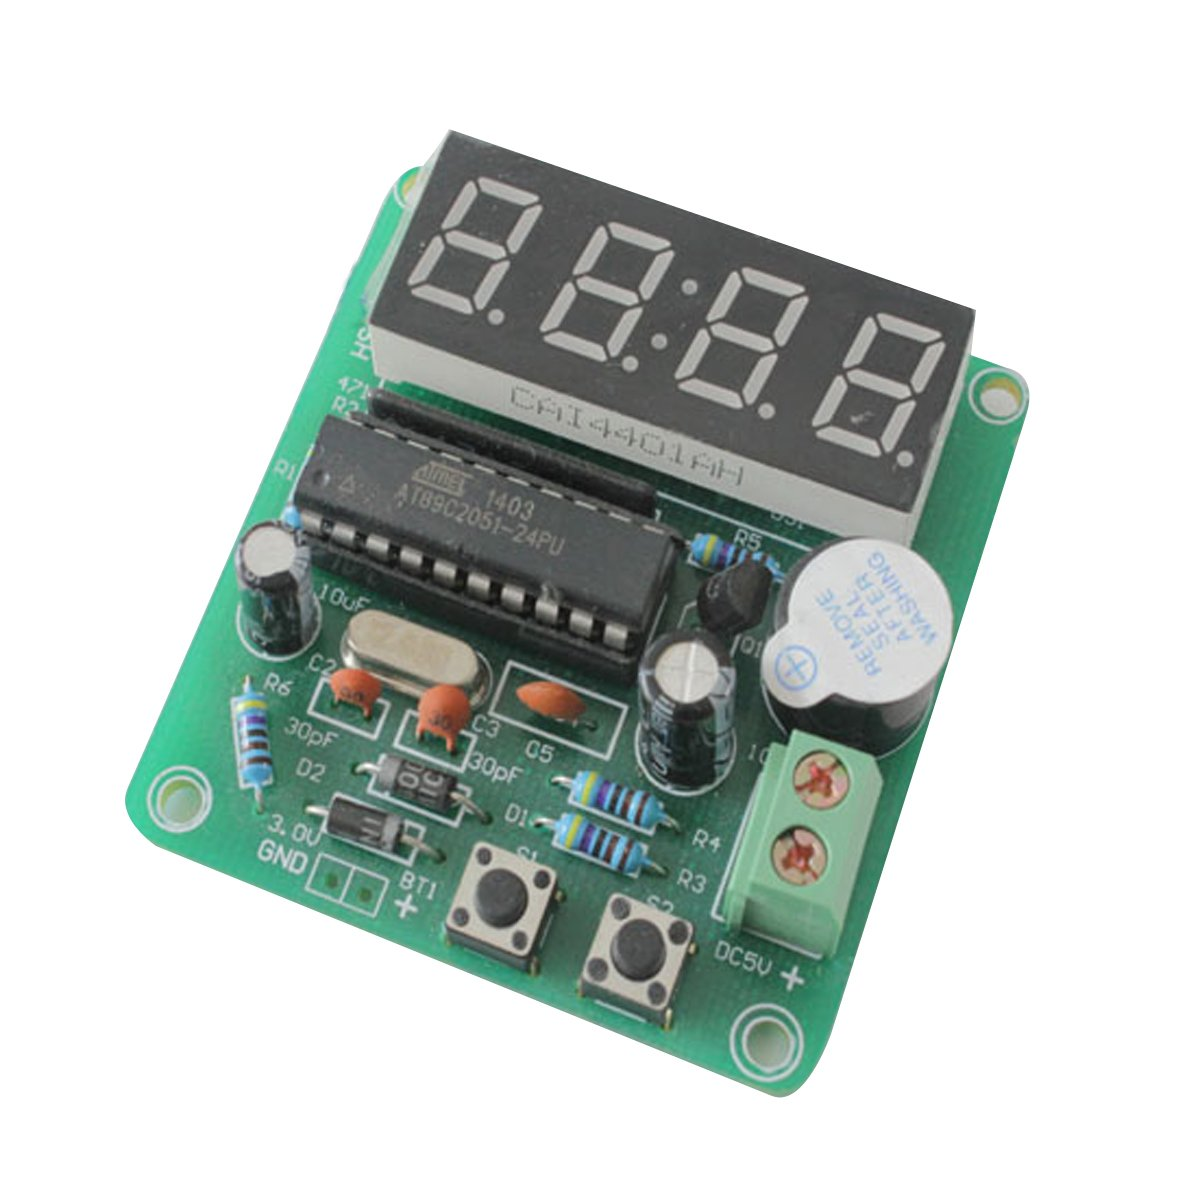 Daoki C51 4 Bits Digital Led Electronic Clock Production Kit Circuit Board Diy Time Suite Kits Set Toys Games